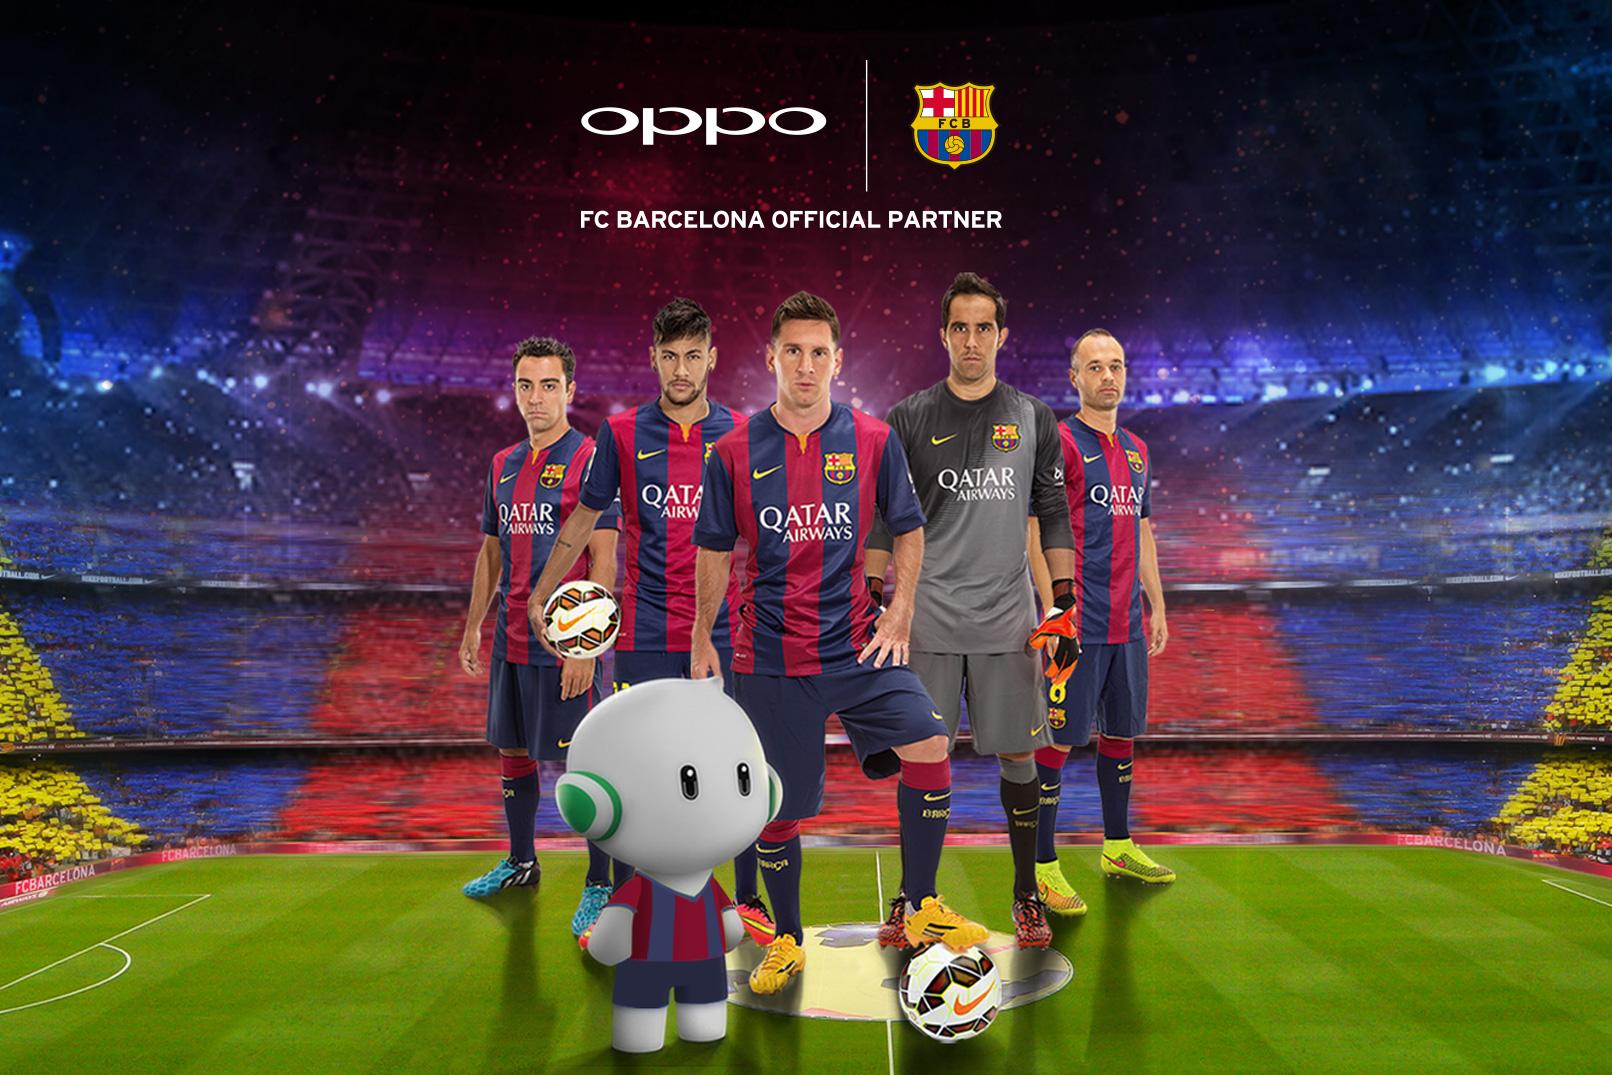 [PR] แฟน OPPO ฉลองชัยยูฟ่า แชมเปี้ยนส์ลีก ร่วมกับแฟน FC Barcelona ทั่วโลก